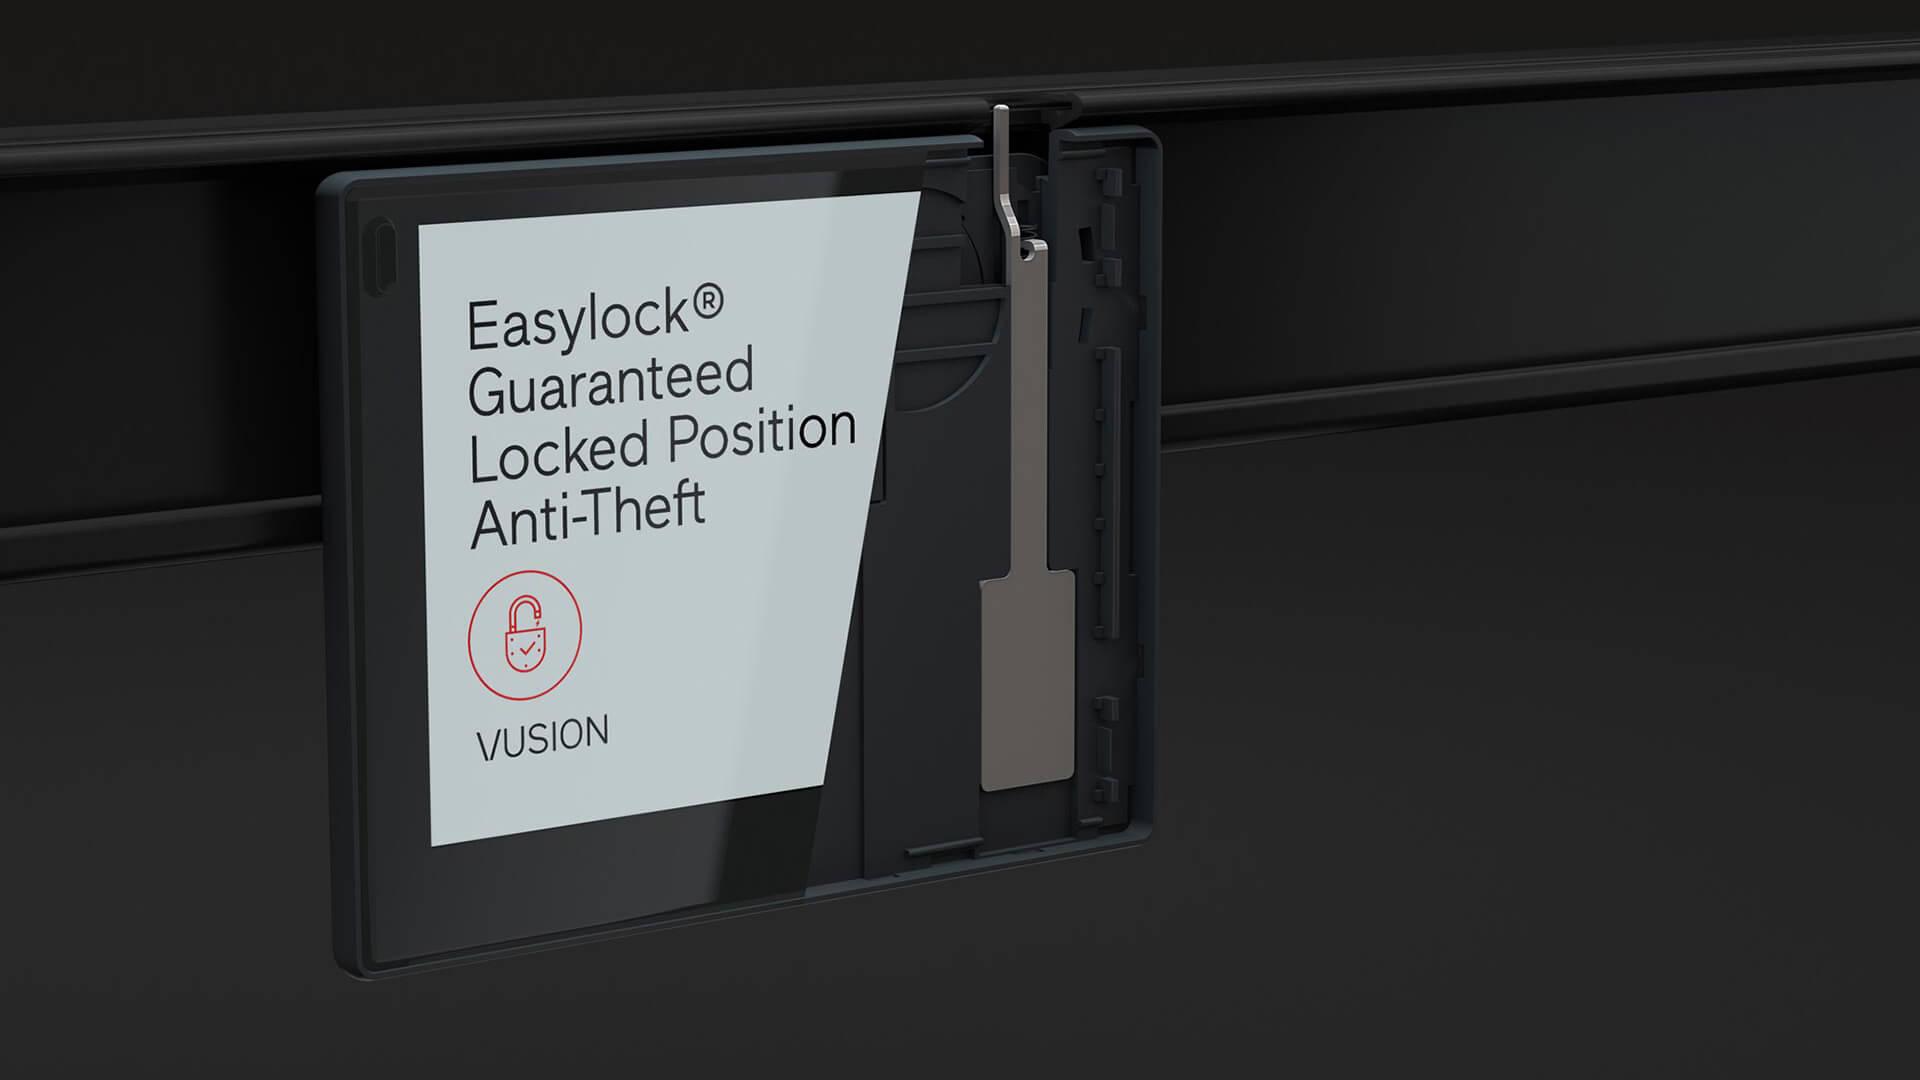 VUSION Easylock-size